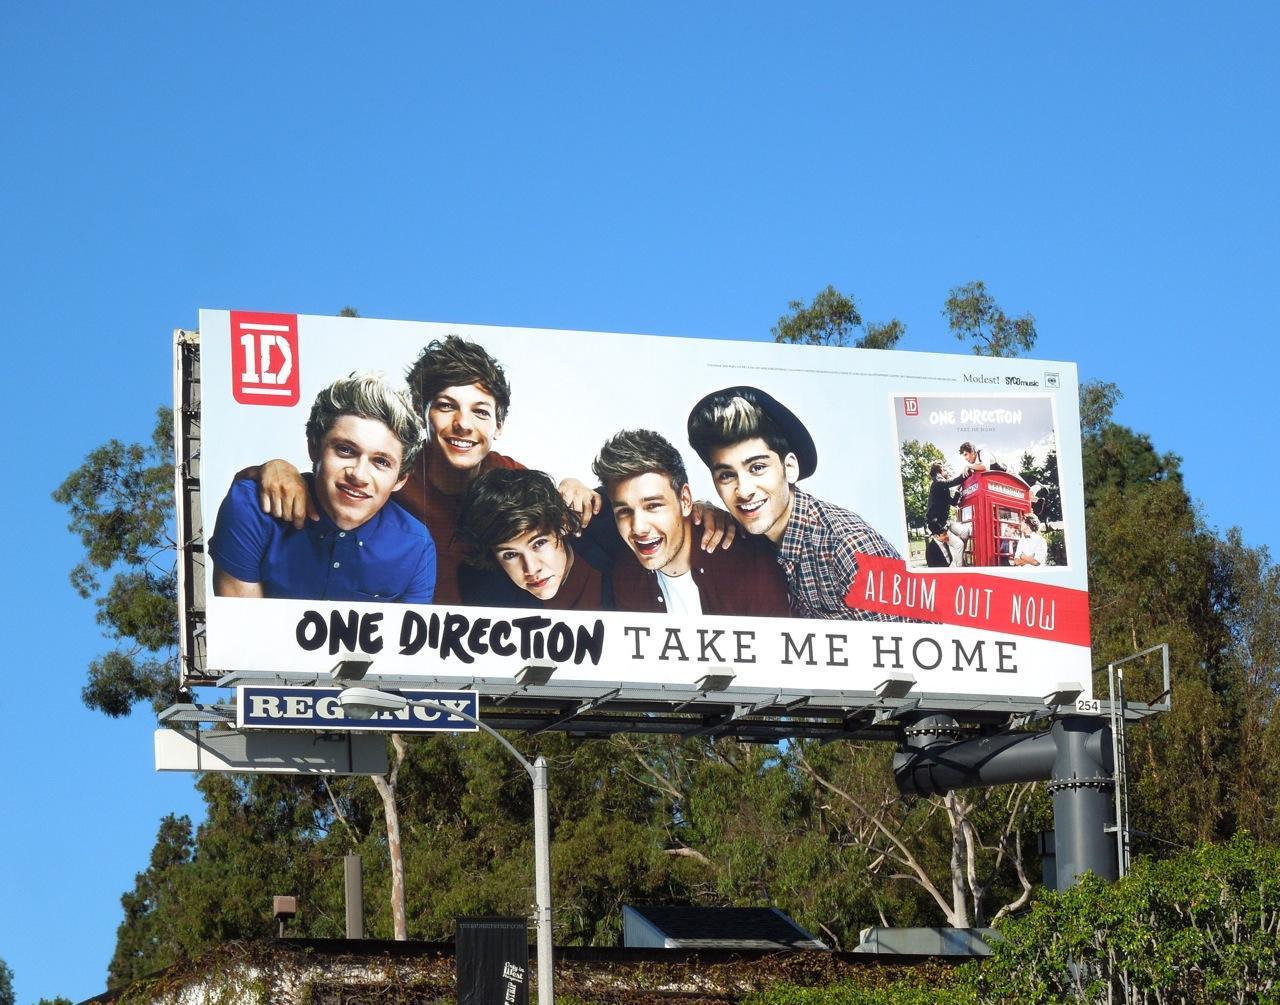 Daily Billboard: One Direction Take Me Home album billboards